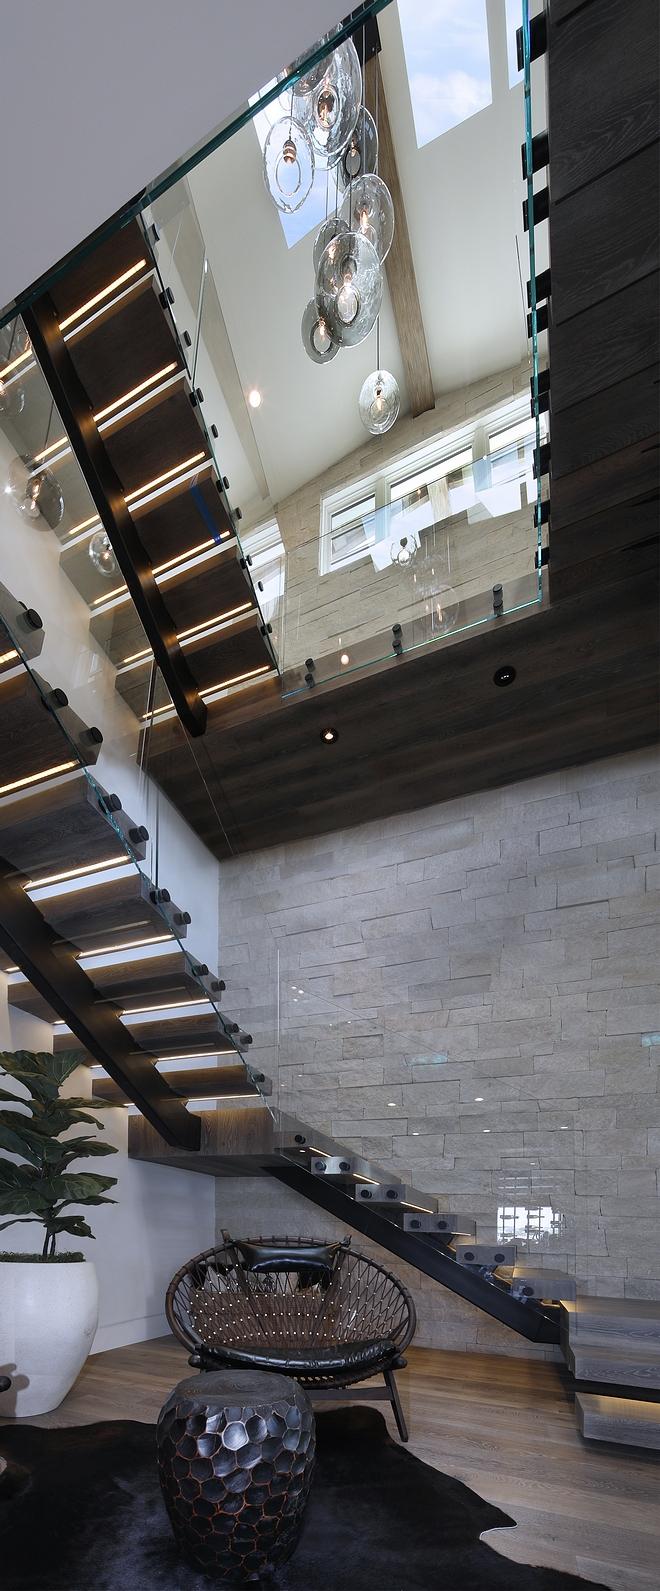 Architectural staircase Architectural staircase ideas Architectural staircase design Architectural staircase Architectural staircase #Architecturalstaircase